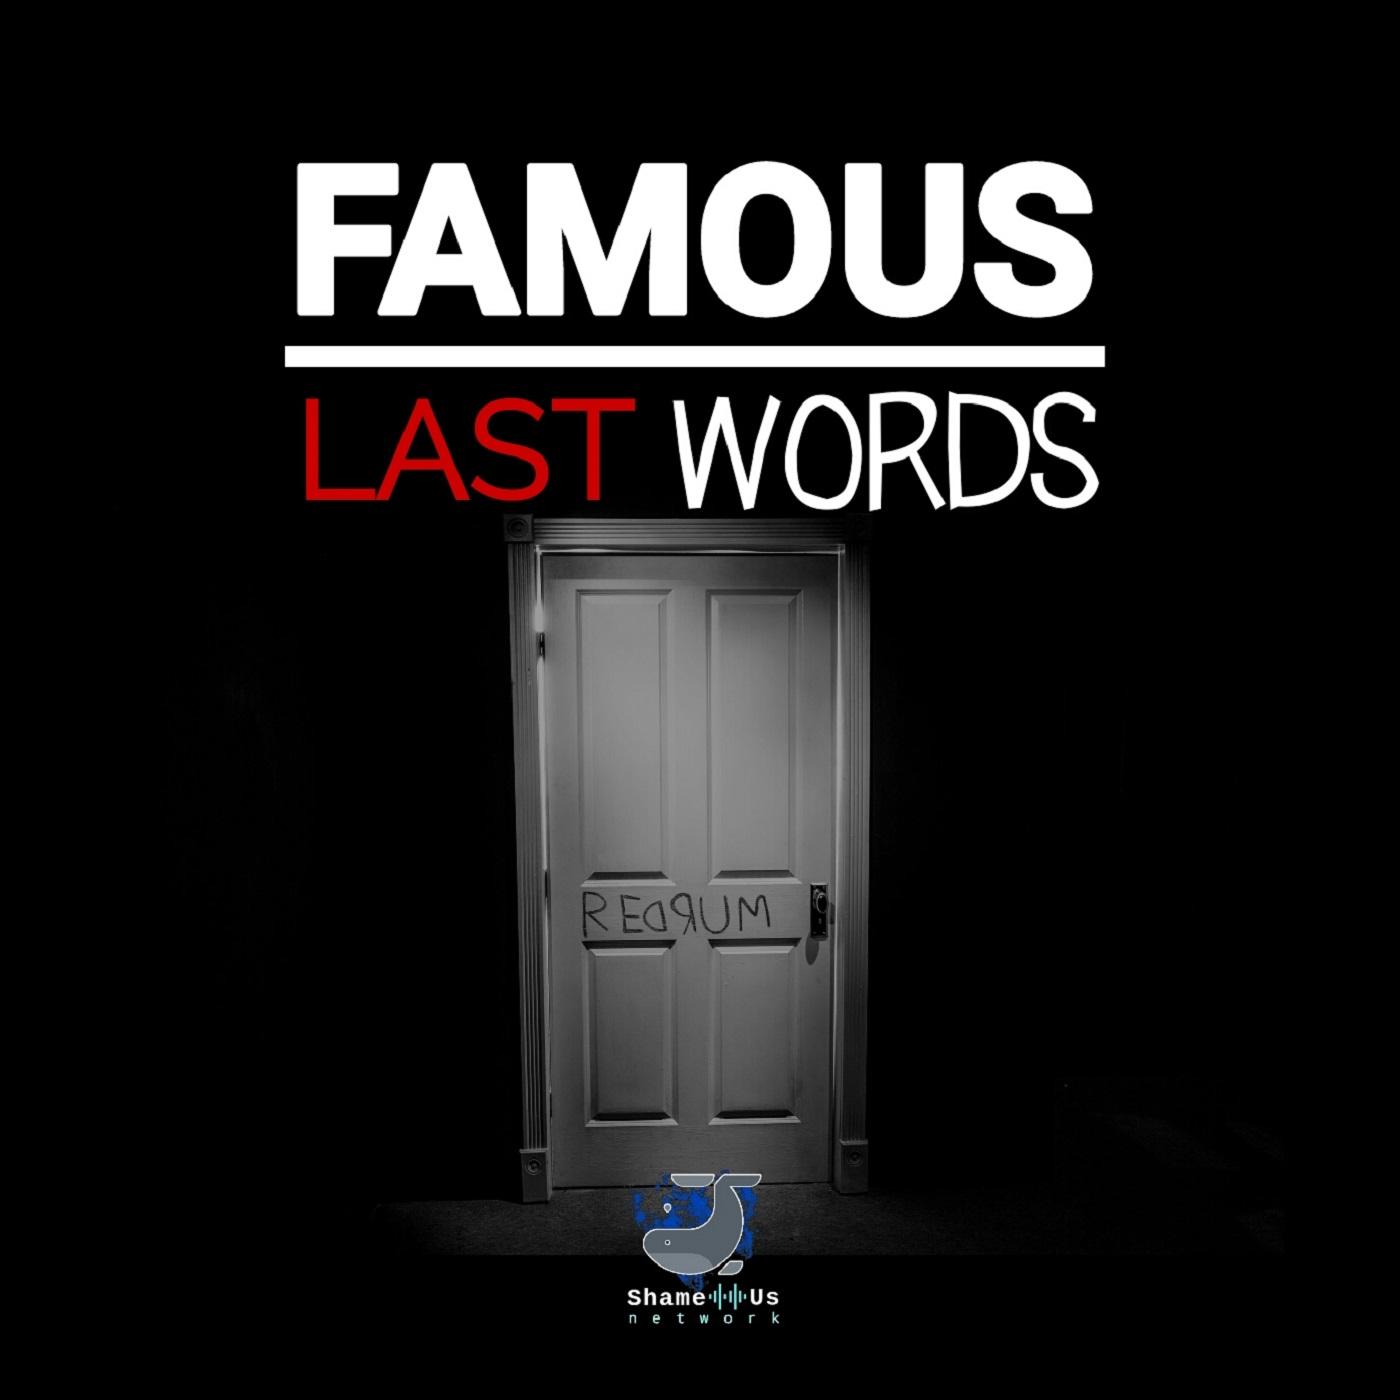 Famous Last Words | Listen via Stitcher for Podcasts